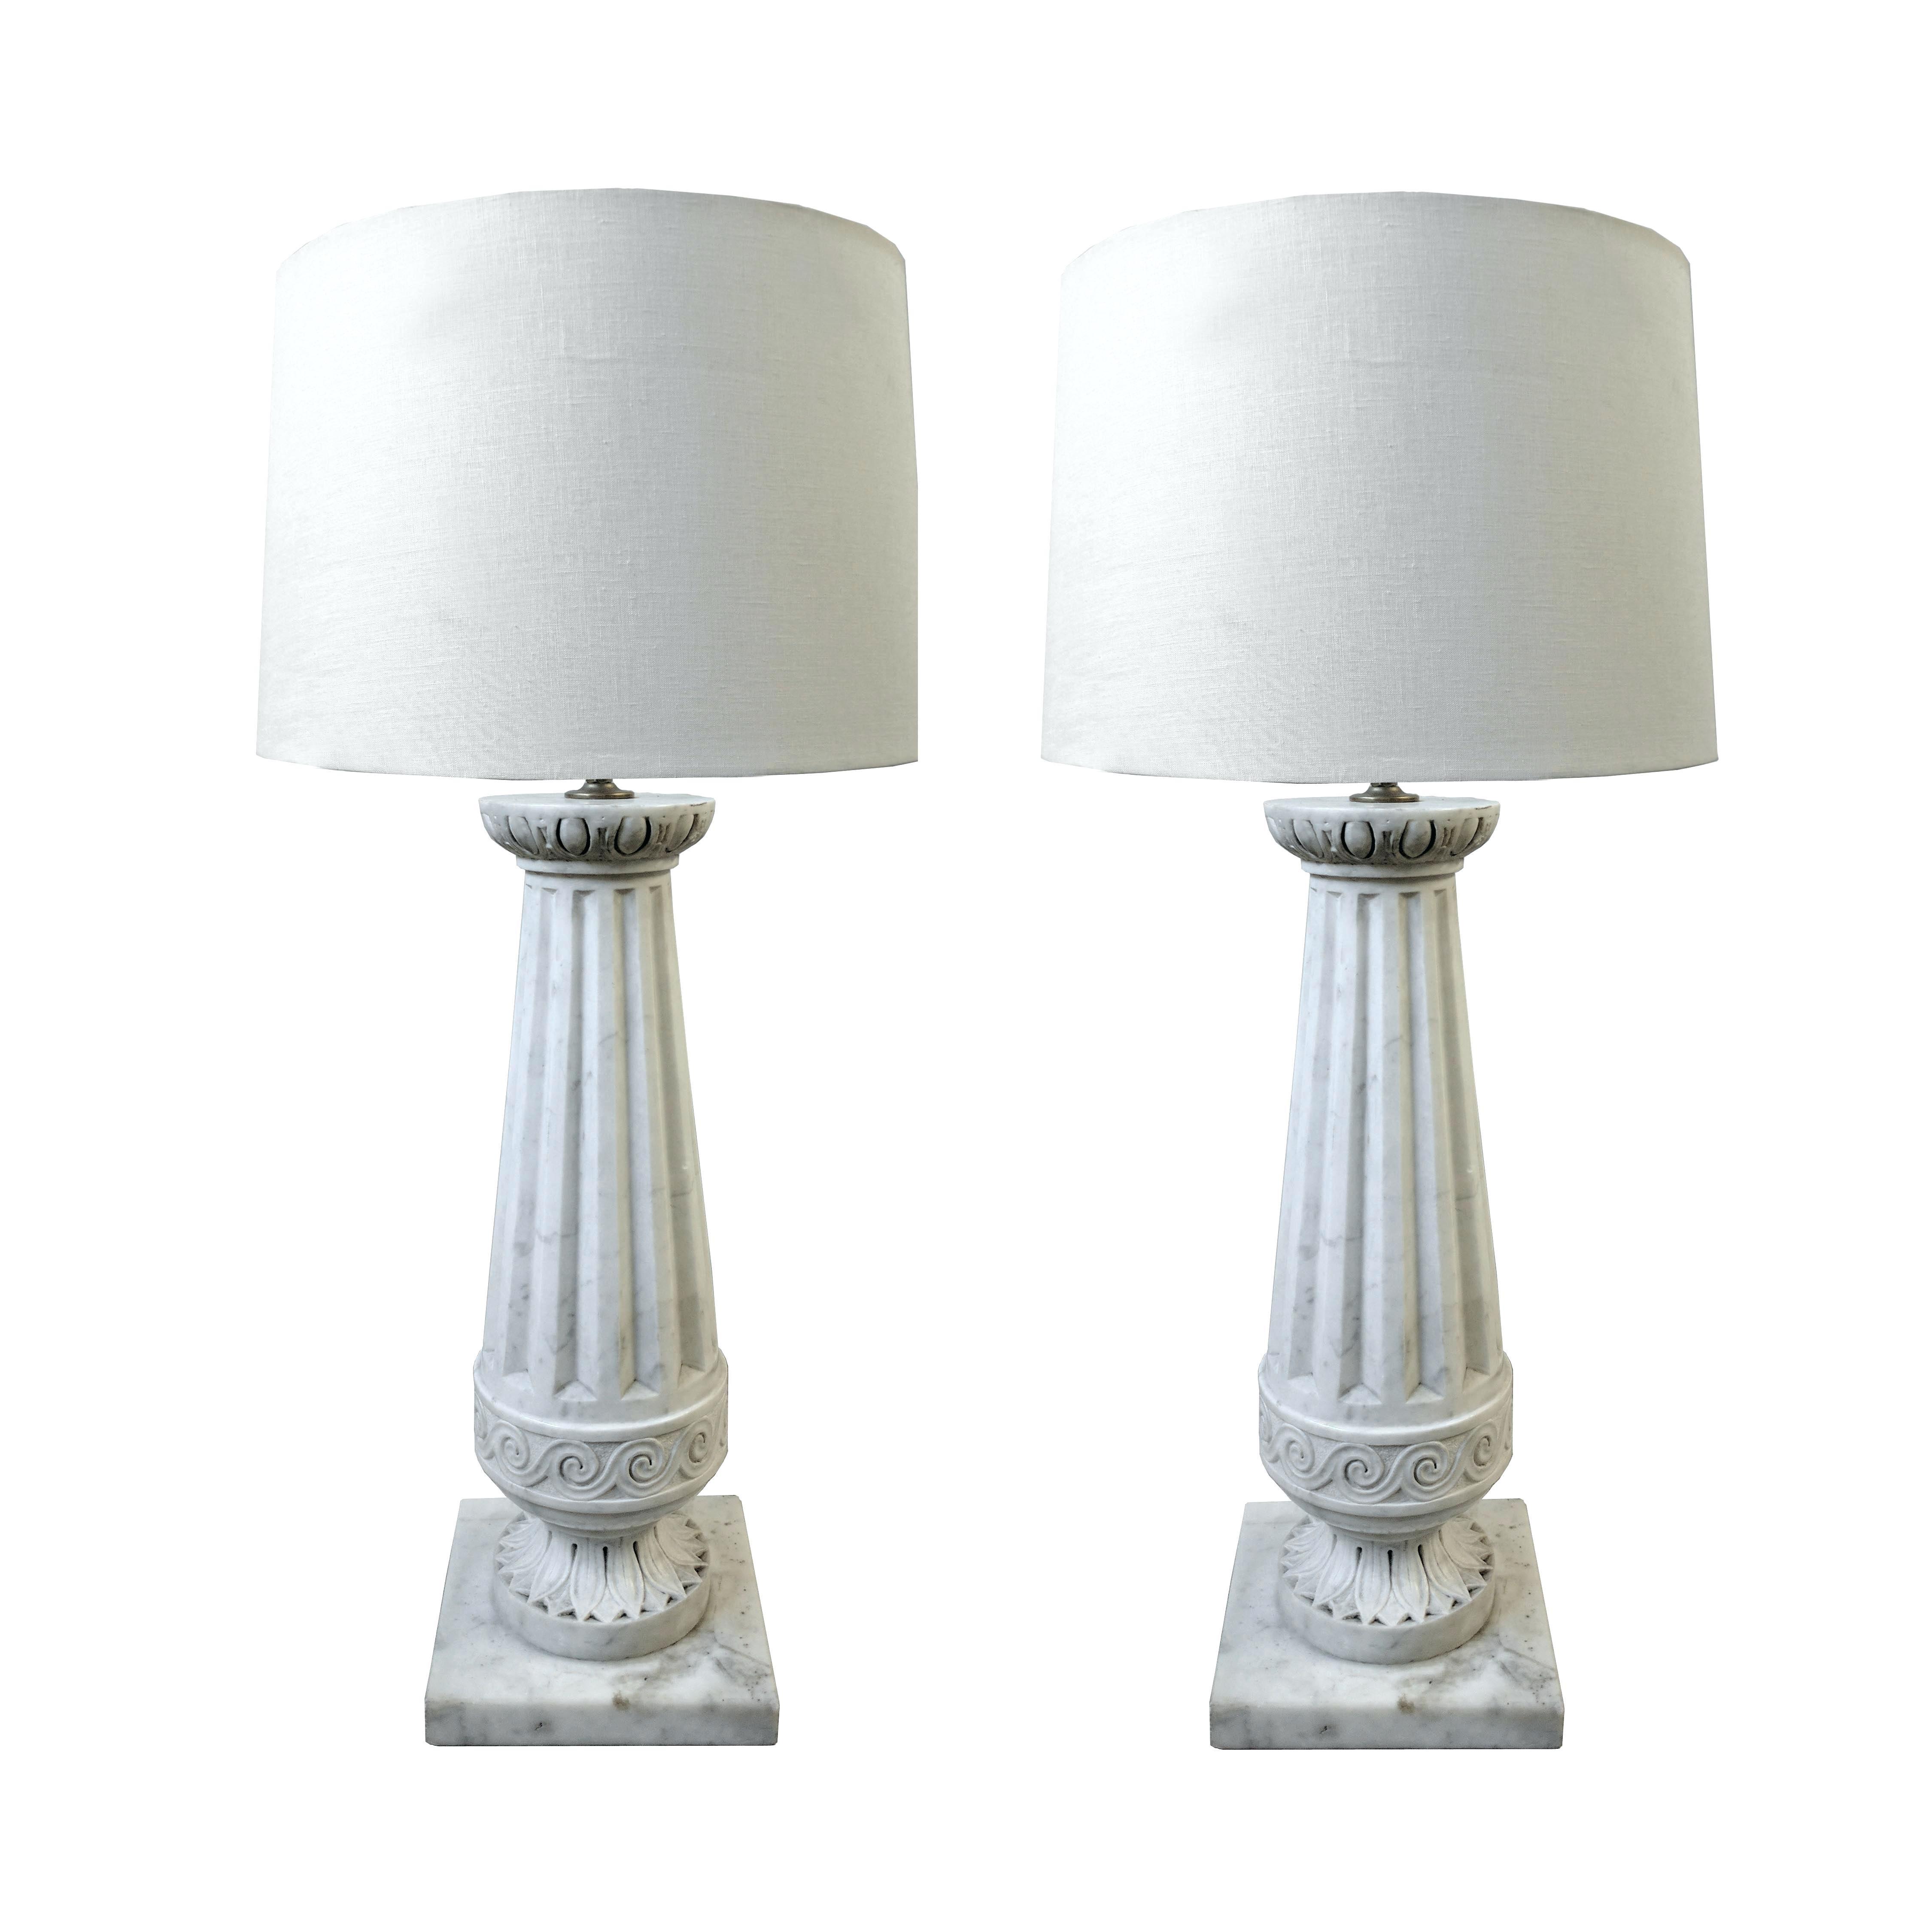 cheap glass hurricane vases of antique brass floor lamp beautiful ao3 210h vases hurricane lamp pertaining to antique brass floor lamp luxury lamps antique marble lamps antique marble glass floor lamp of antique